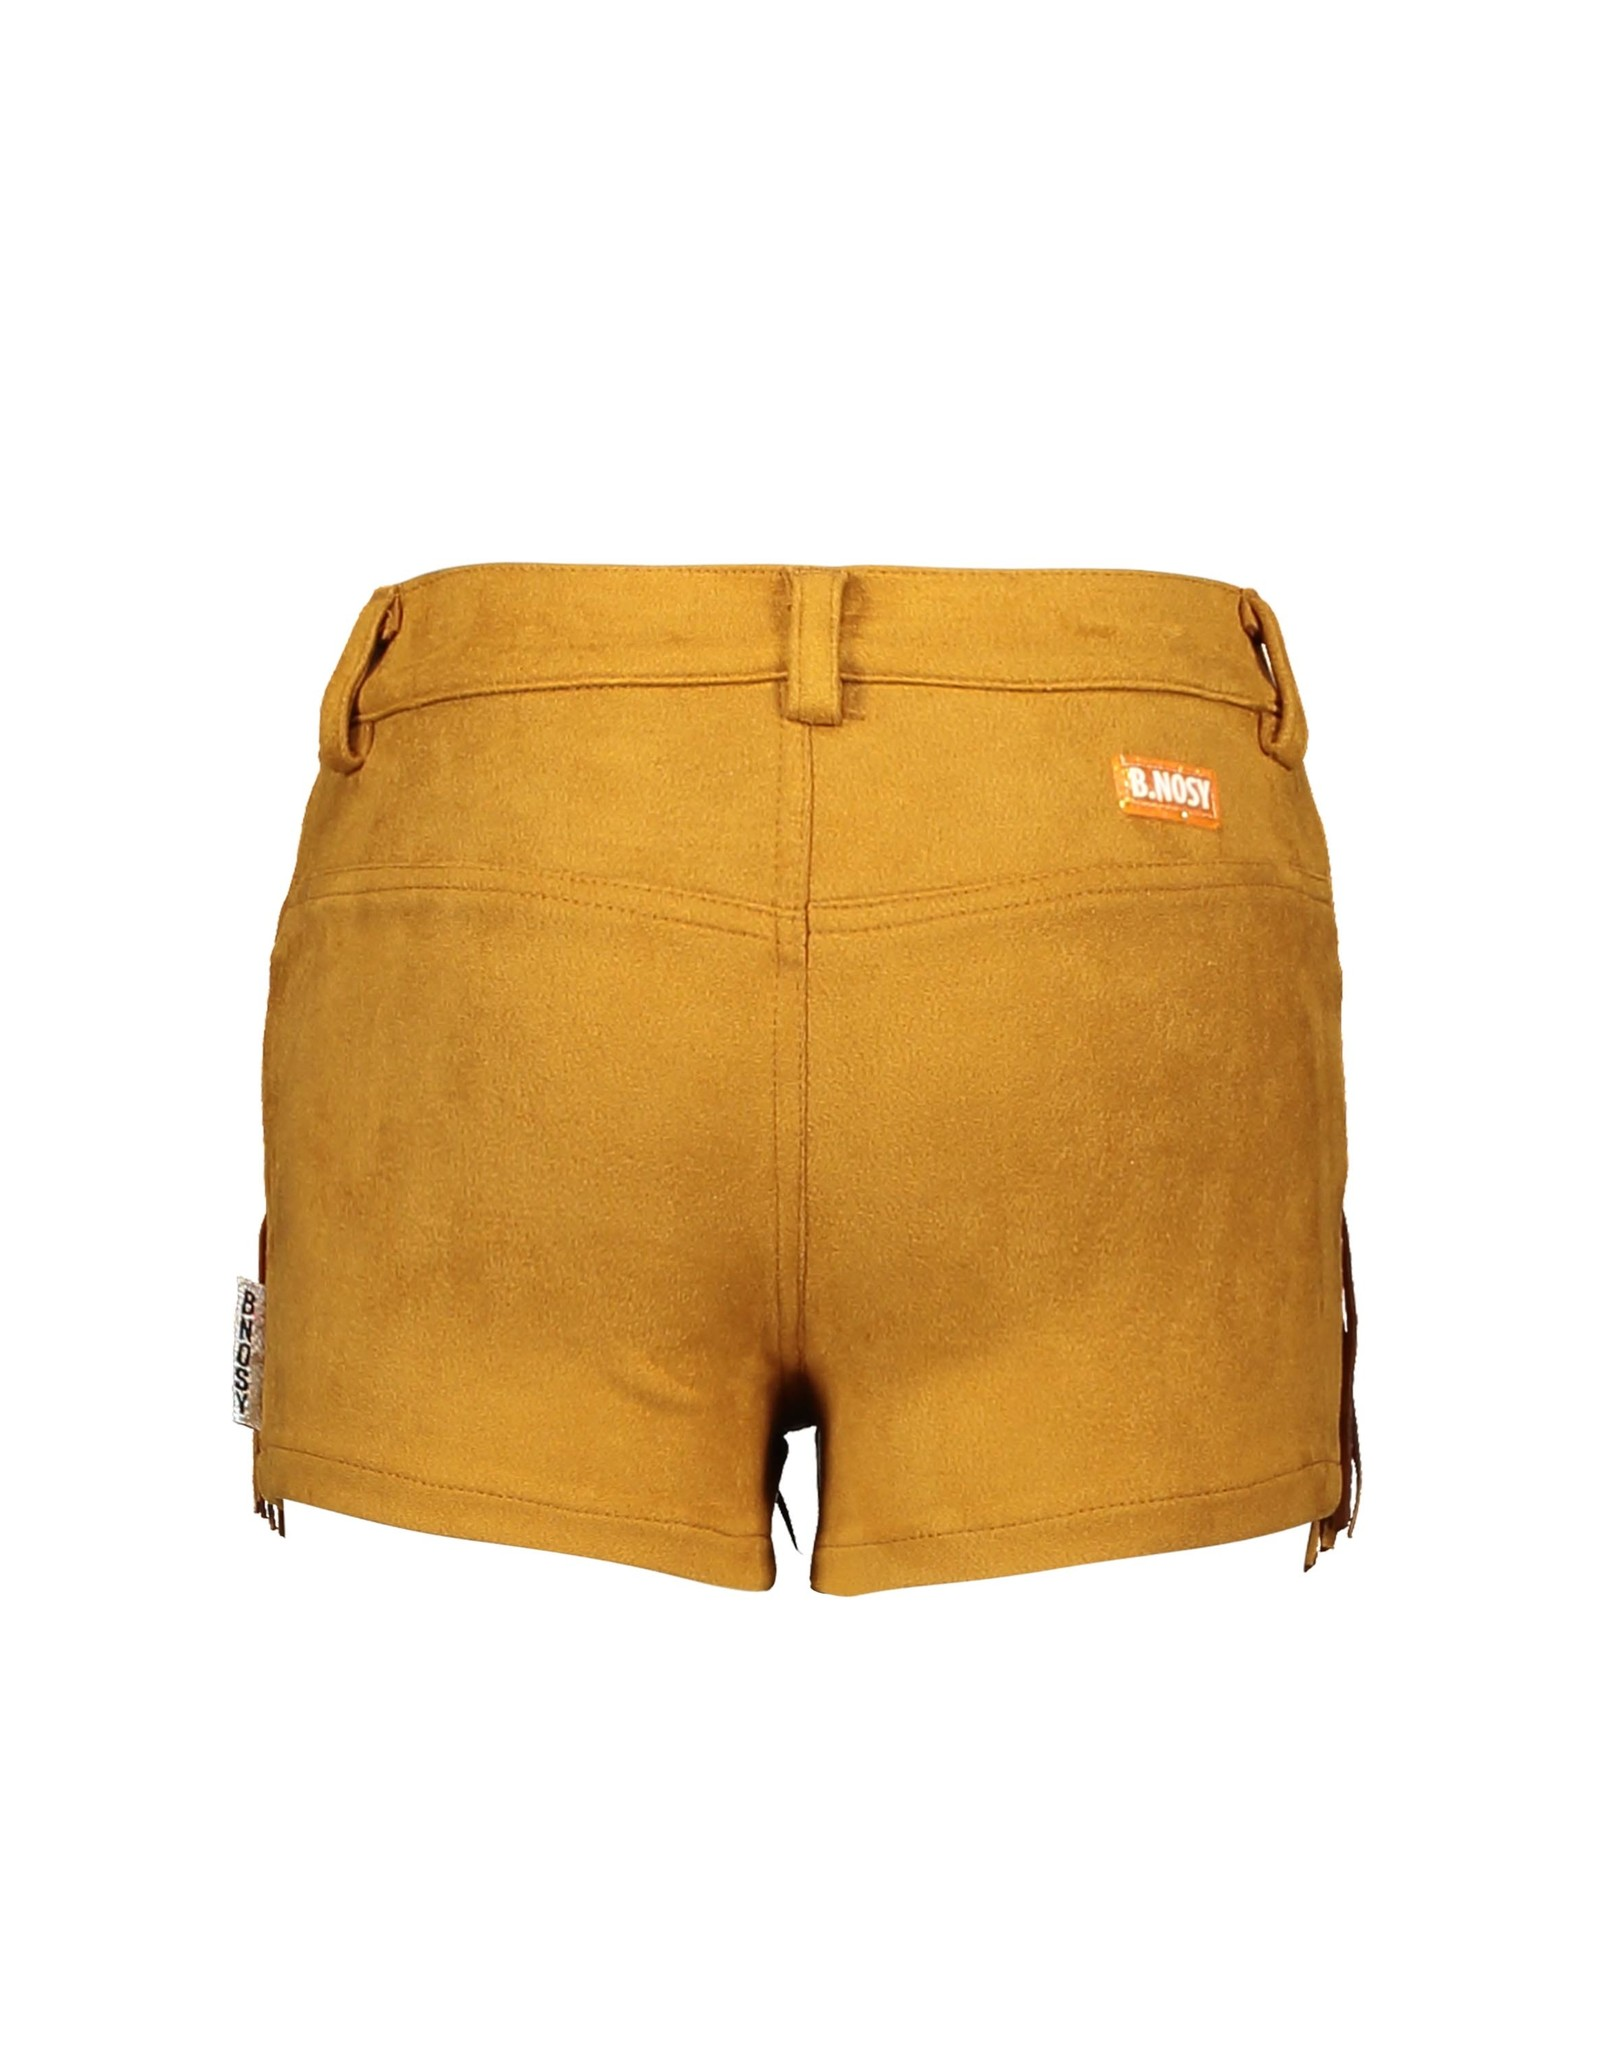 B.Nosy B.Nosy Girls fake Suede Shorts Melee Print Mustard